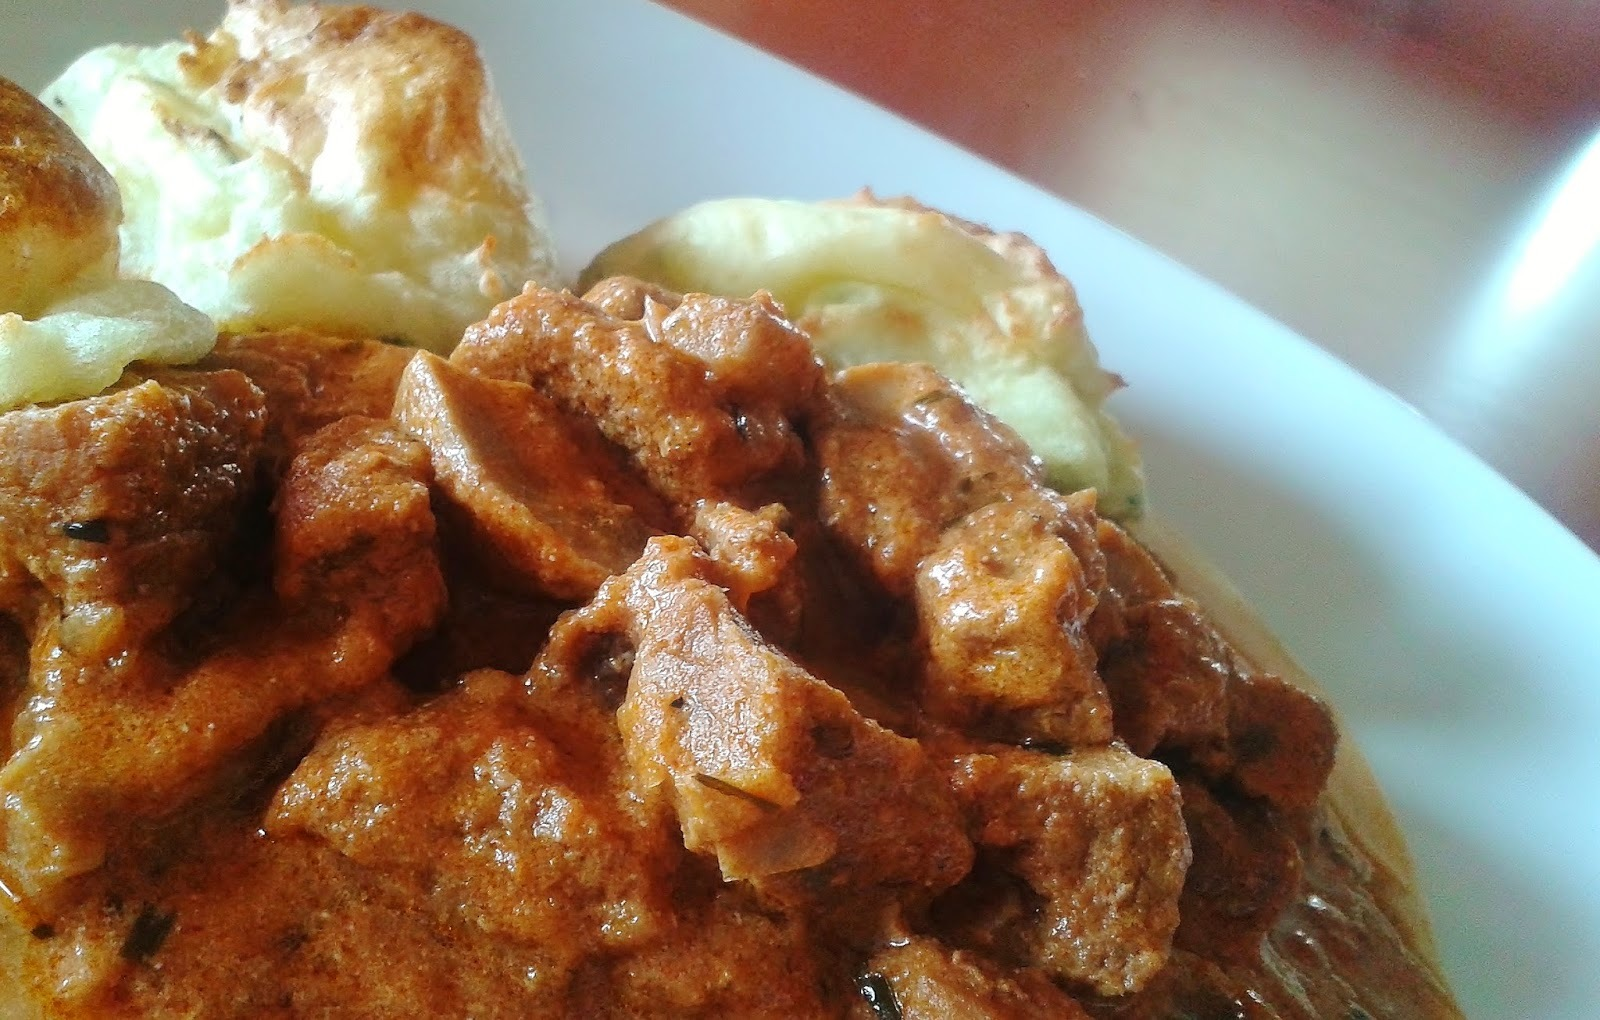 Tárkonyos-gombás borjúragu snidlinges krumplipüré-puffanccsal